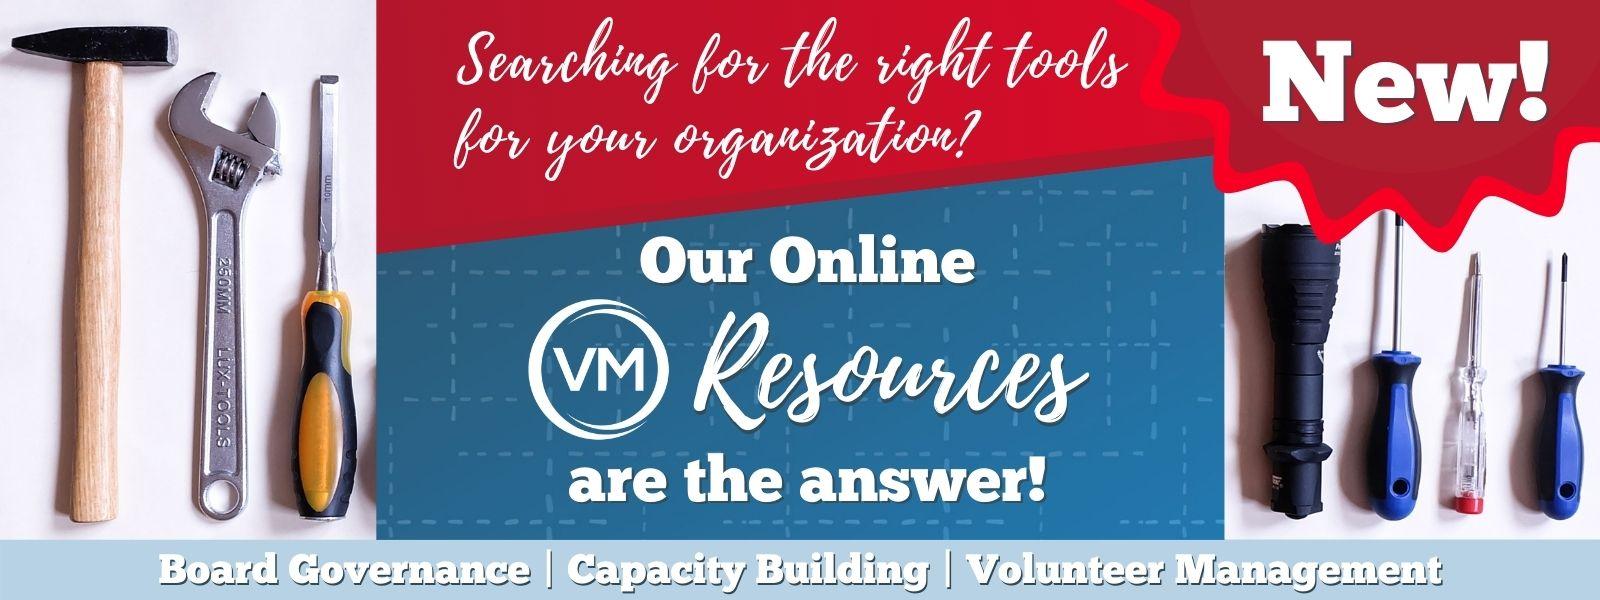 New Online Resources